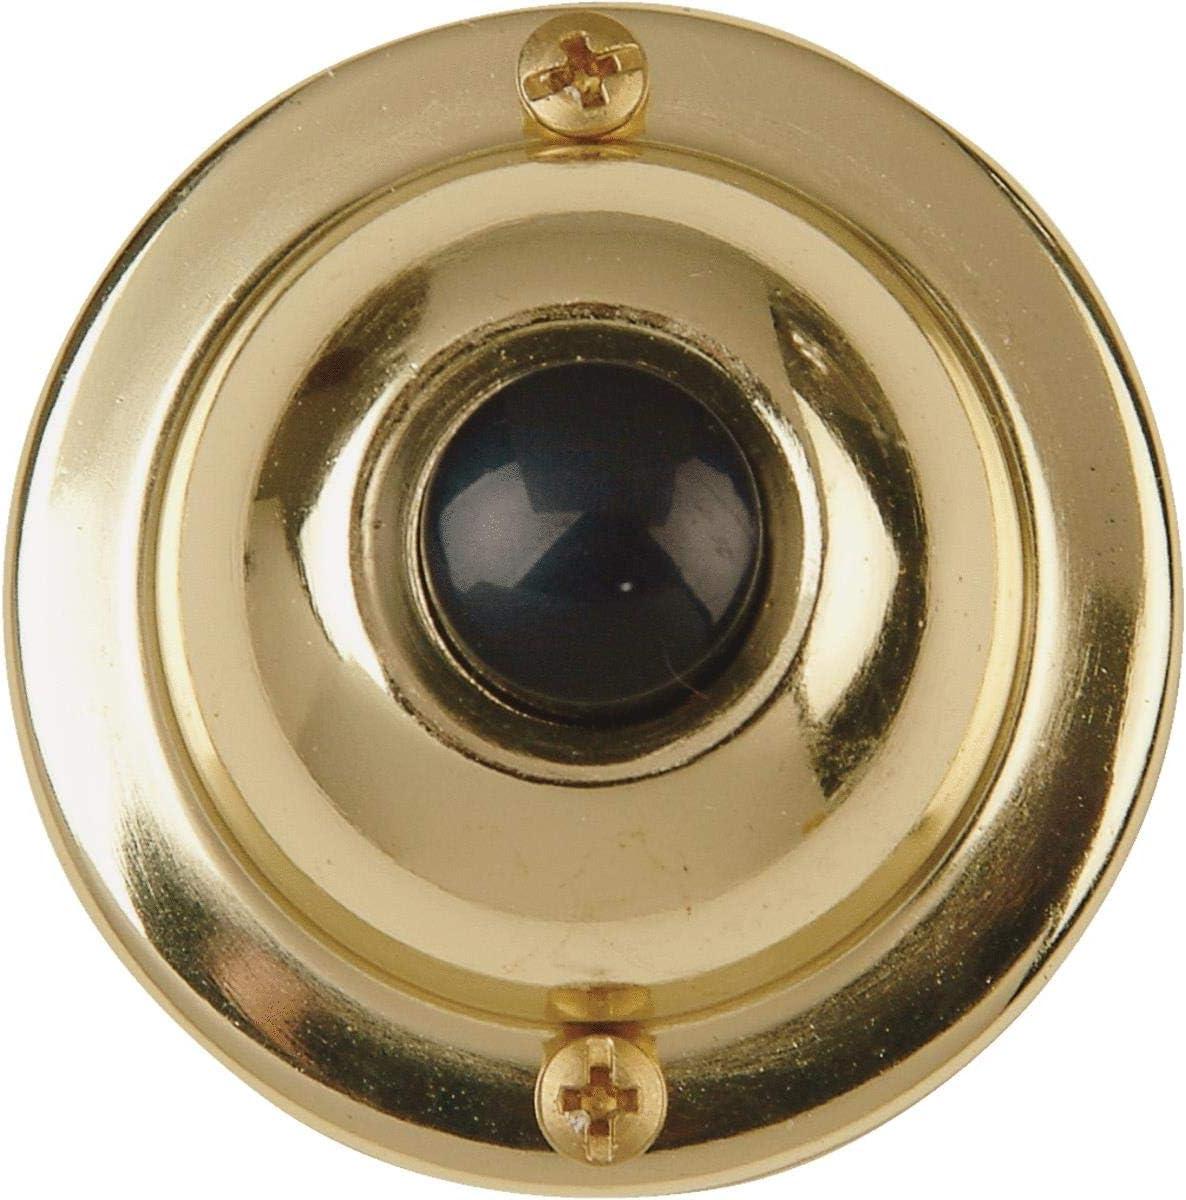 IQ America Lighted Doorbell Push-Button 1 Each